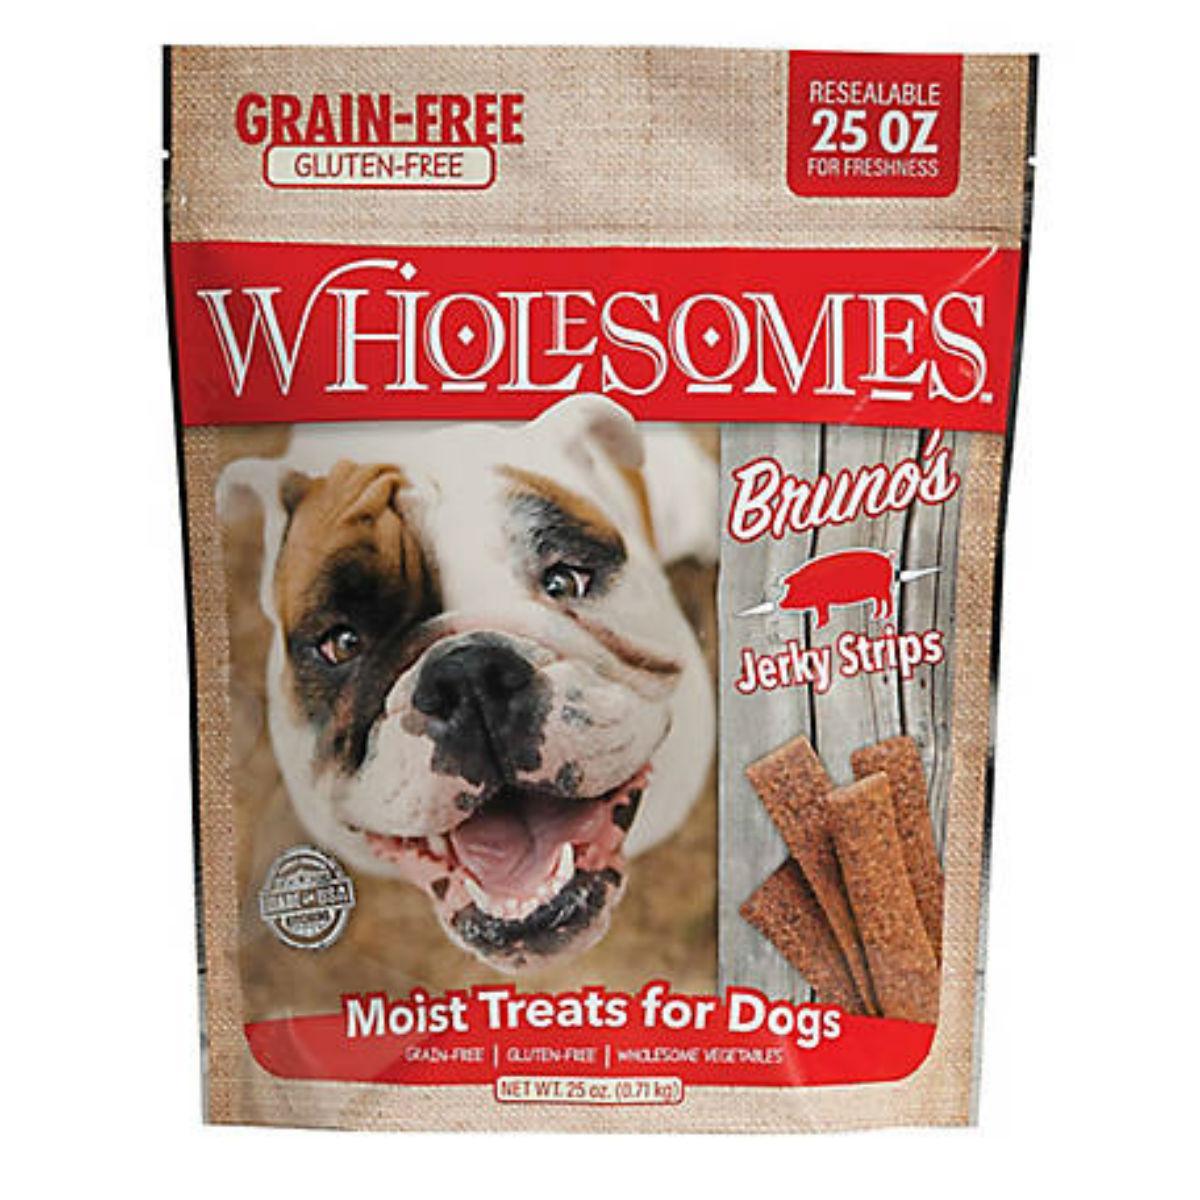 Sportmix Wholesomes Bruno's Pork Jerky Strips Dog Treats